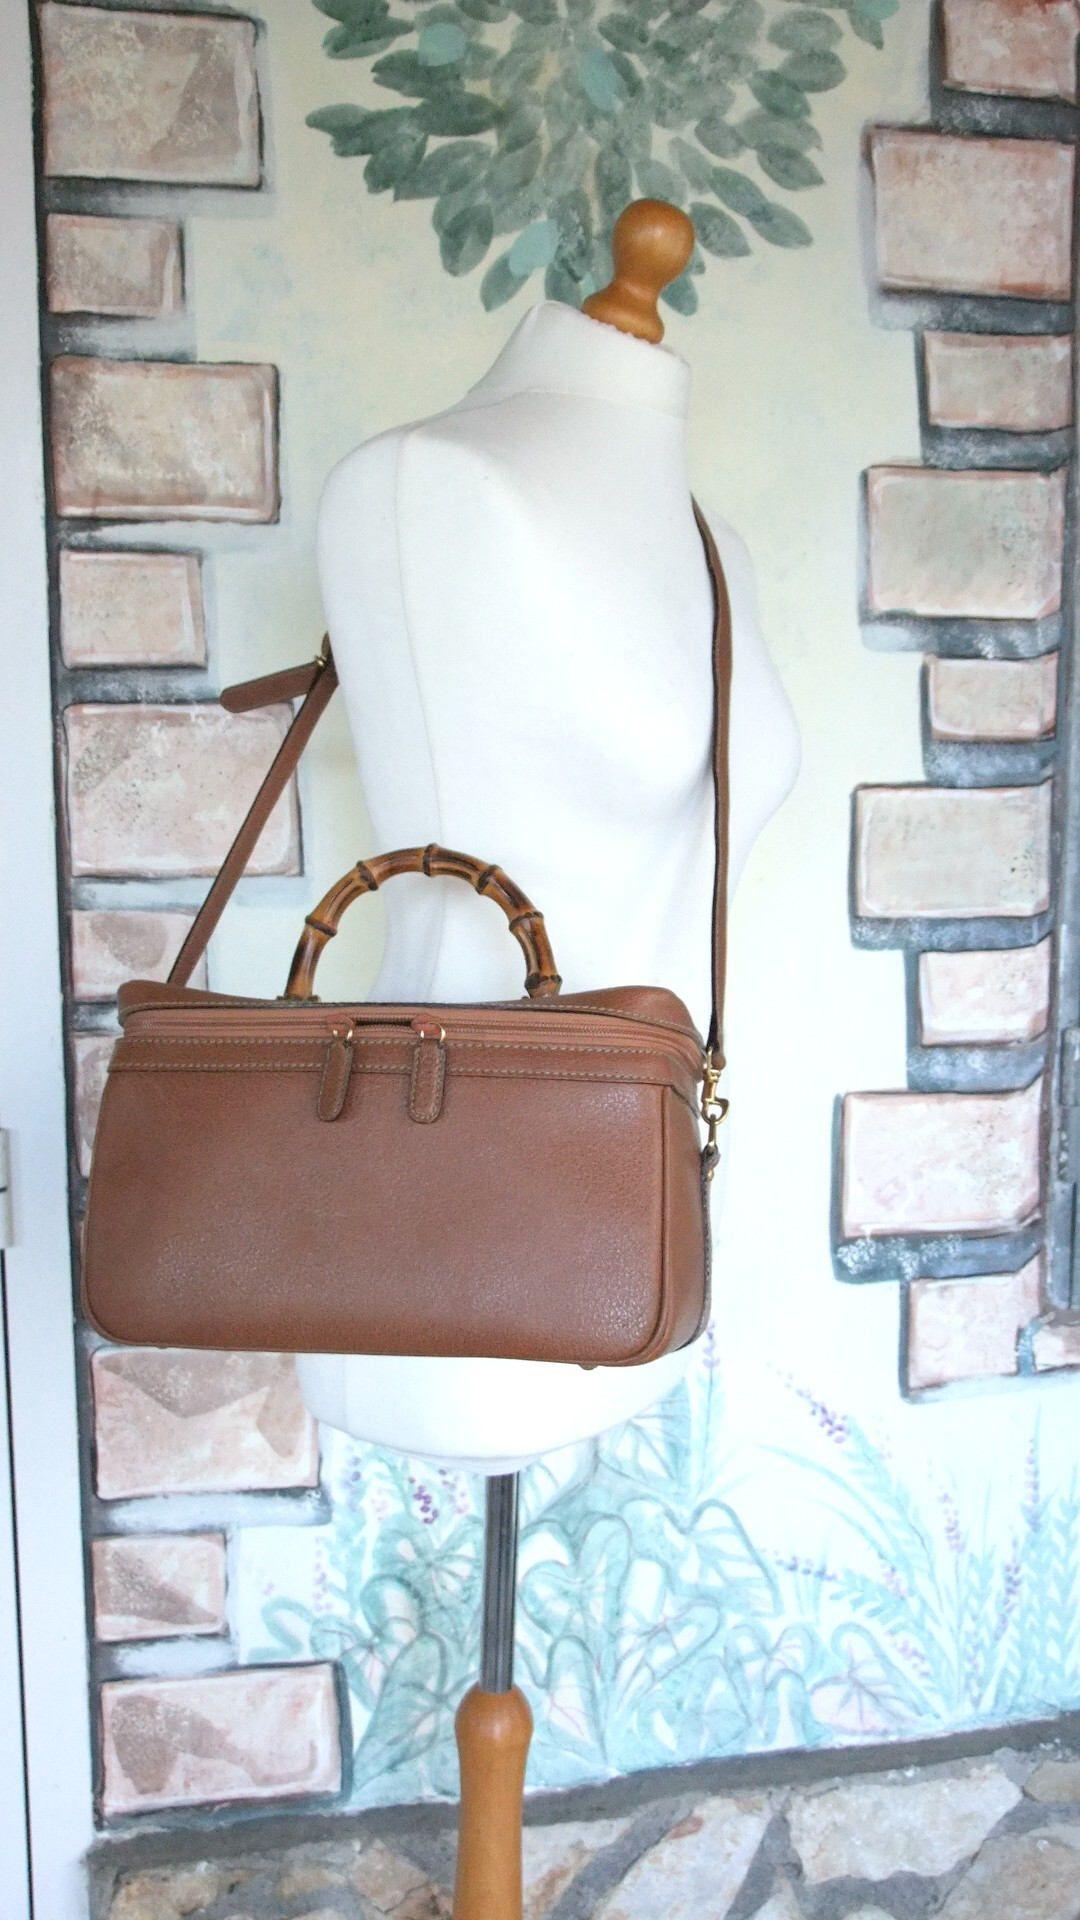 Gucci - Beauty case Cognac - Leather and bamboo di Tikyvintage su Etsy f61977e7c113